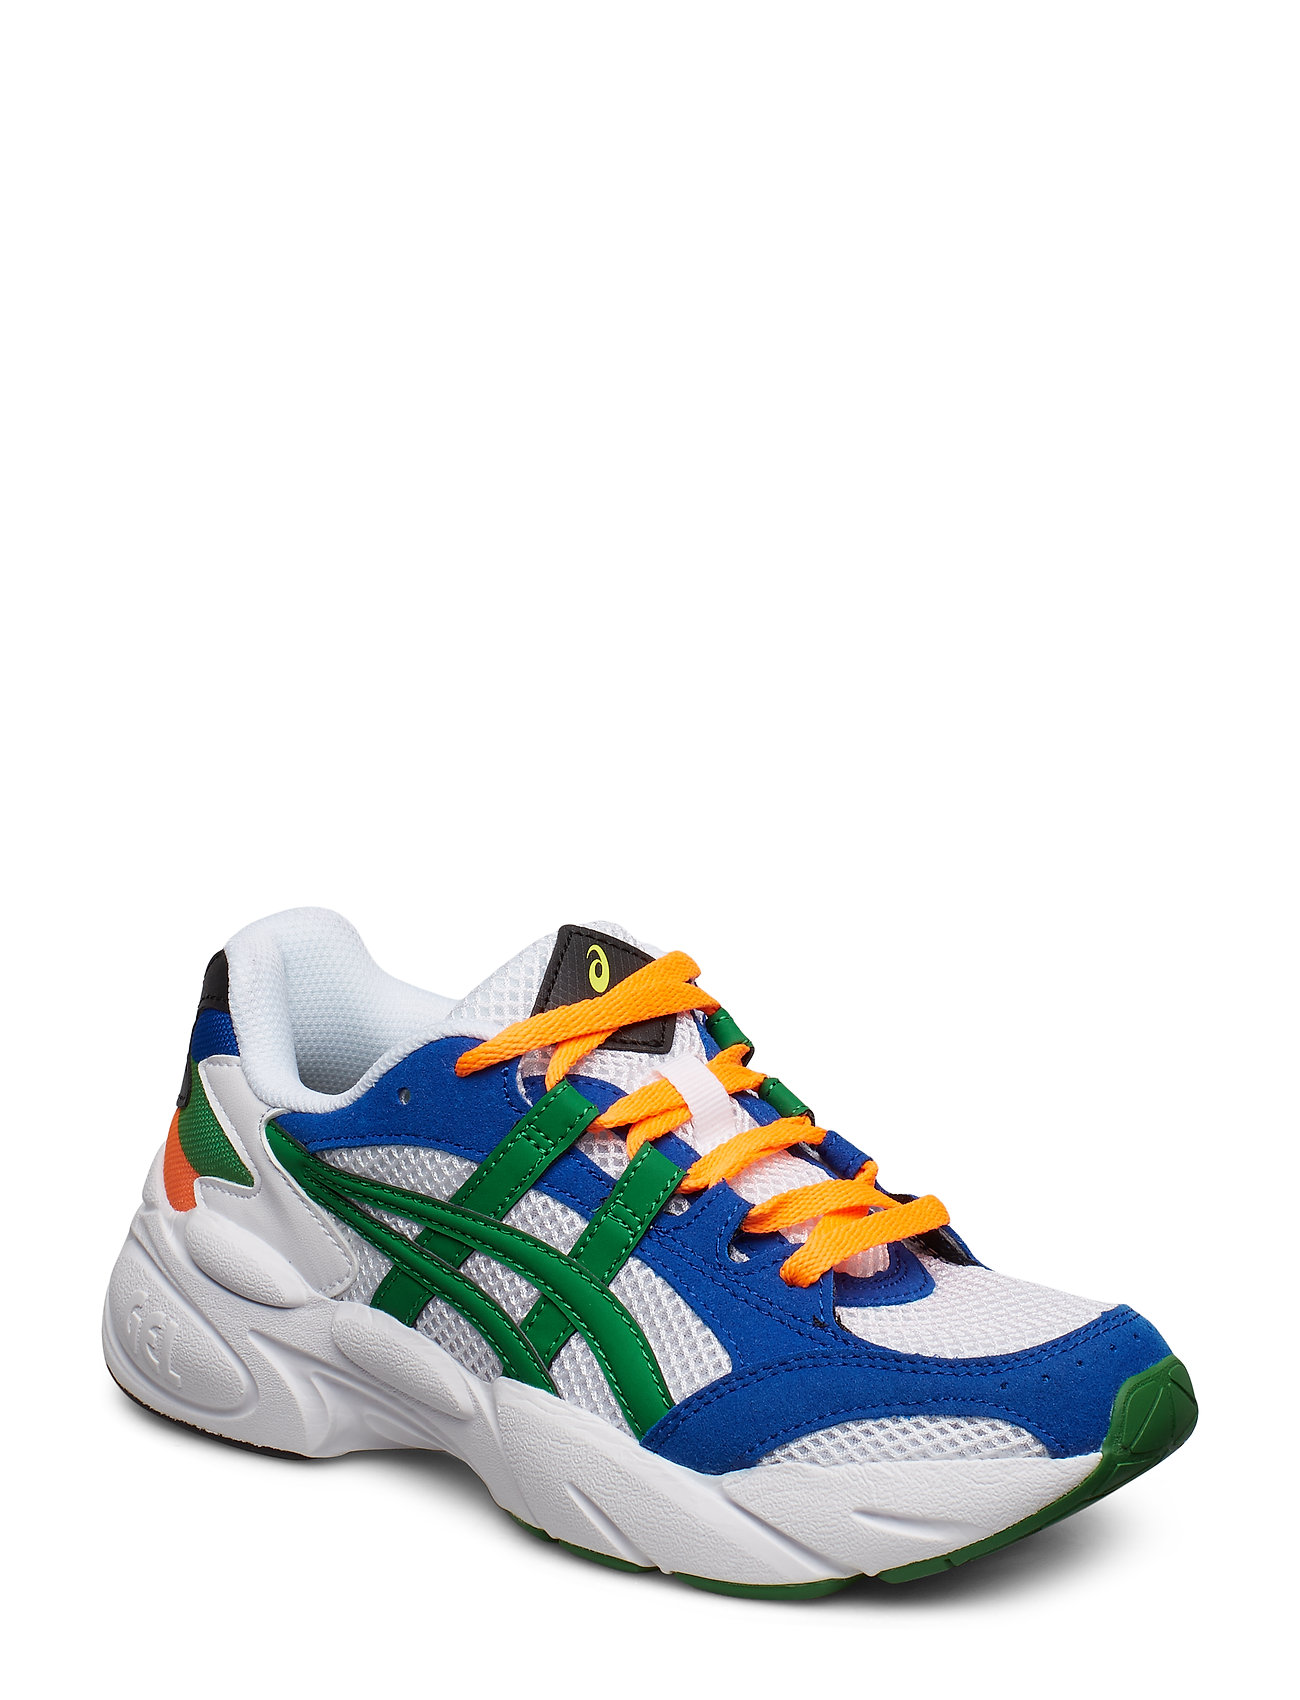 ASICS Gel-Bnd Niedrige Sneaker Blau ASICS